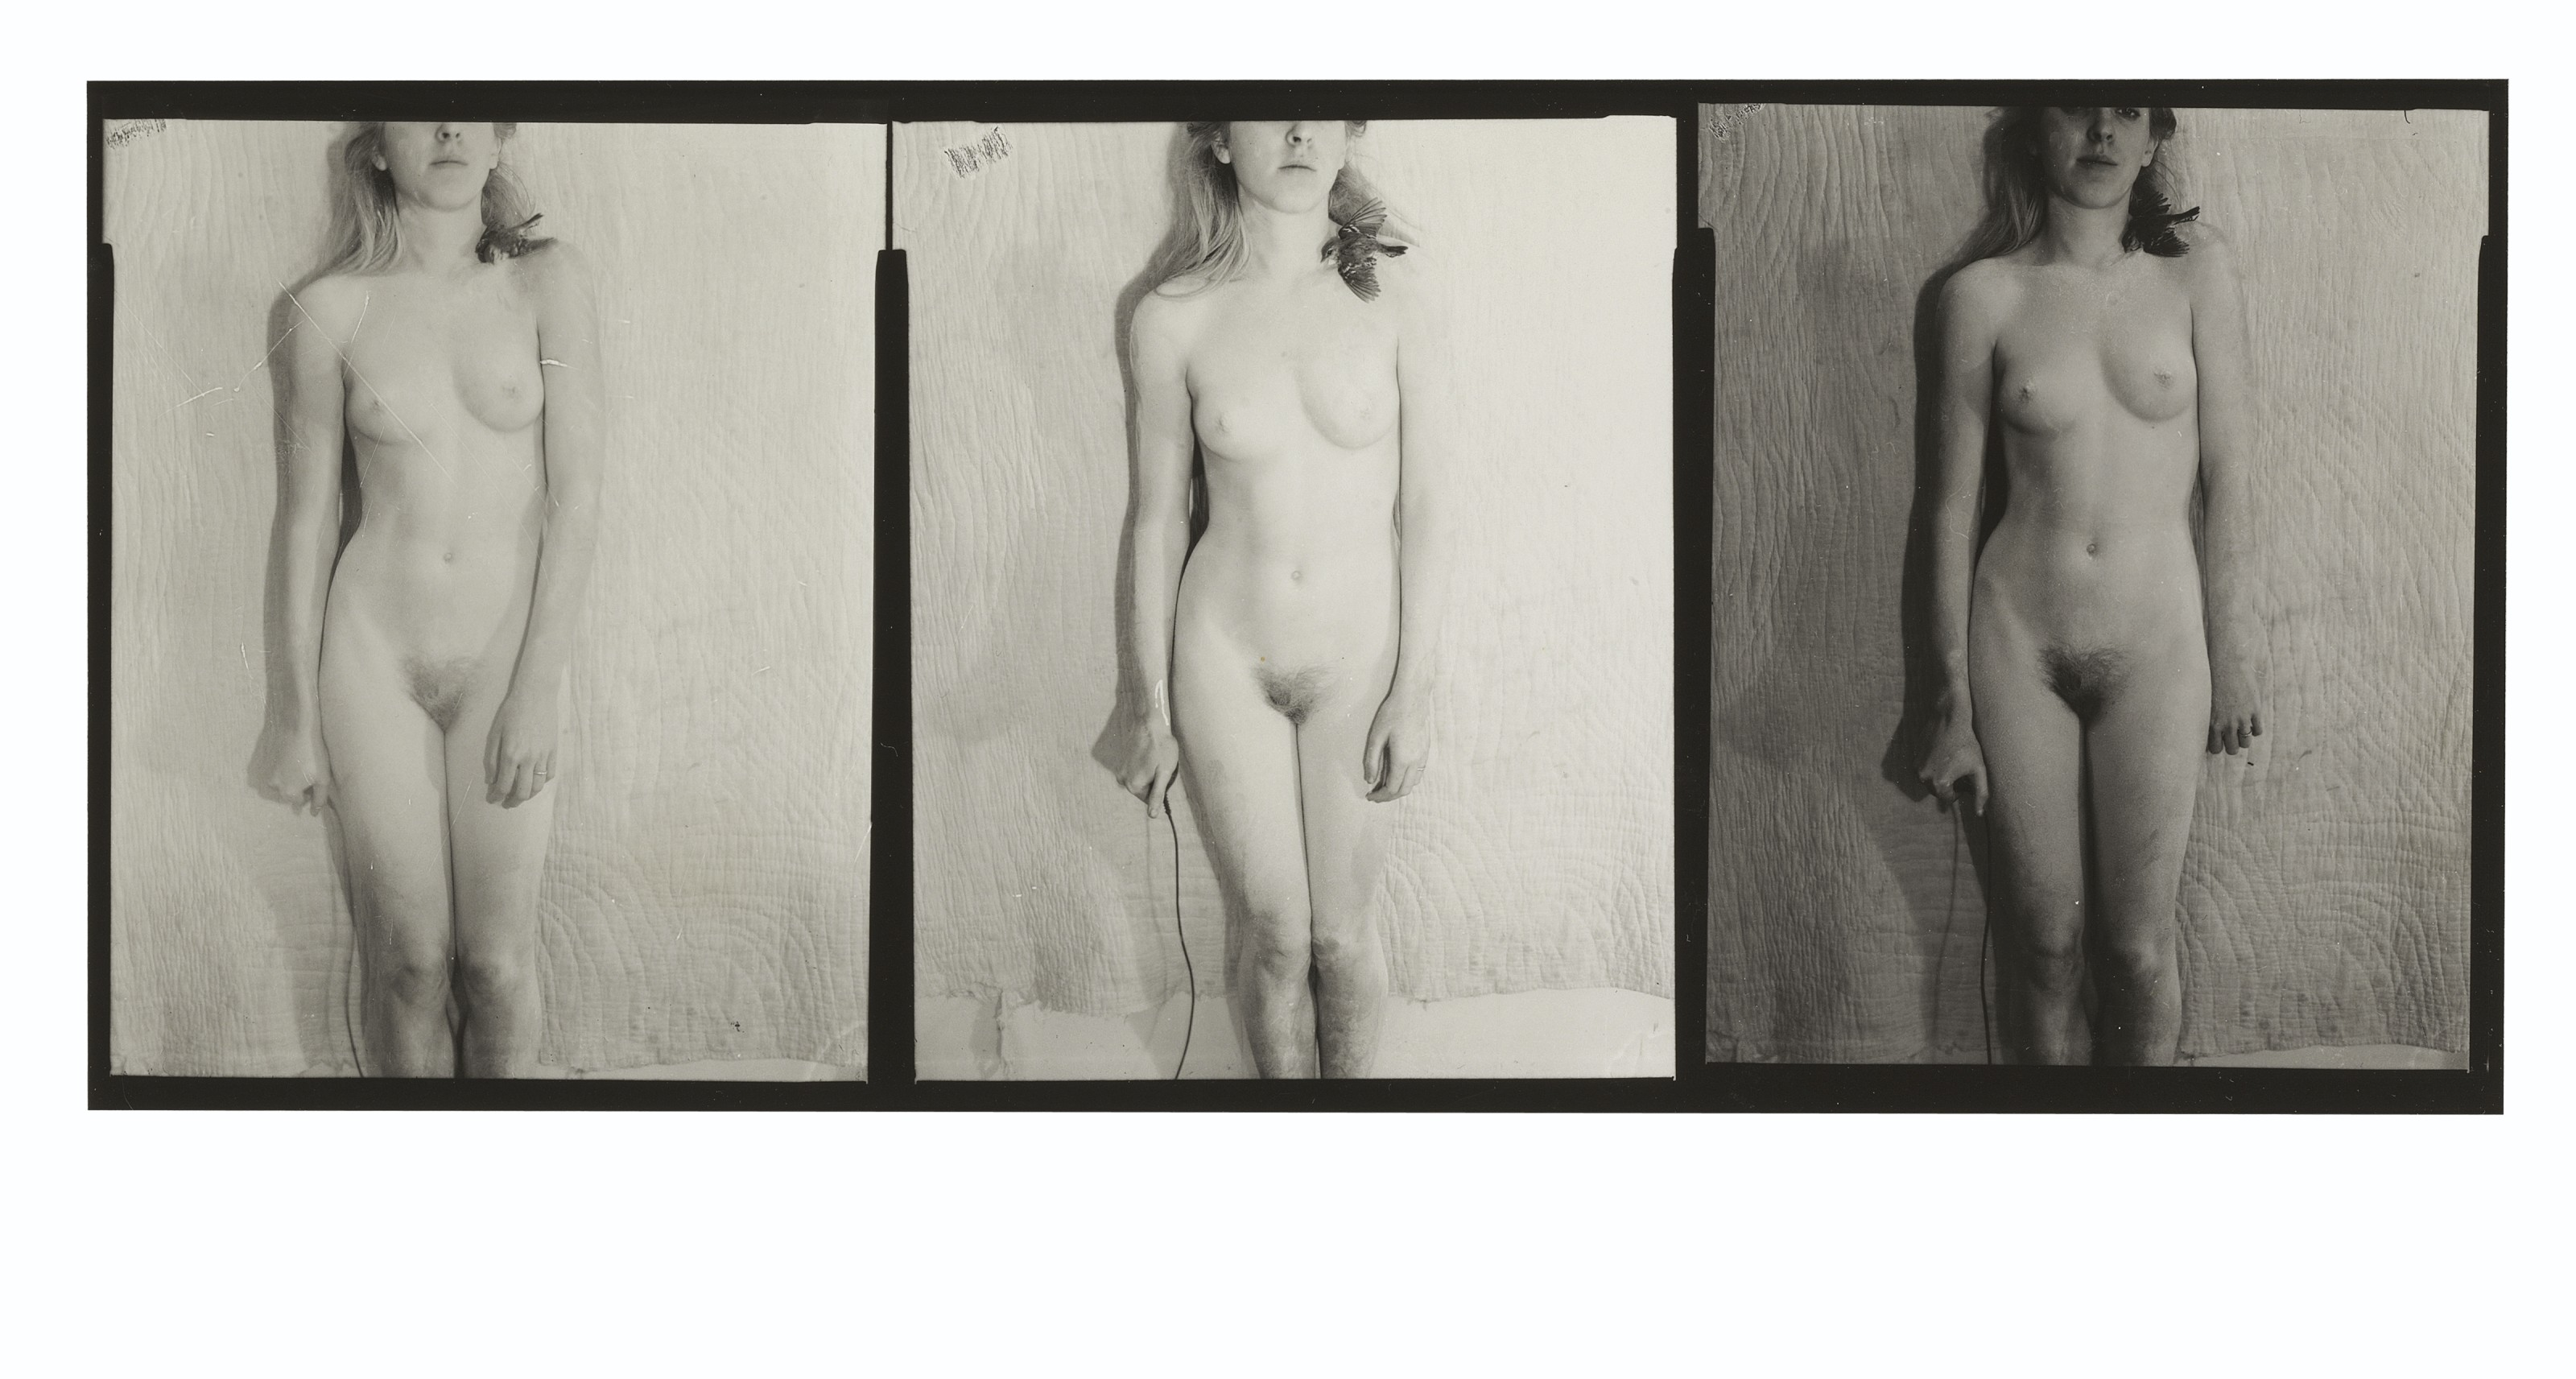 Untitled, New York, 1980